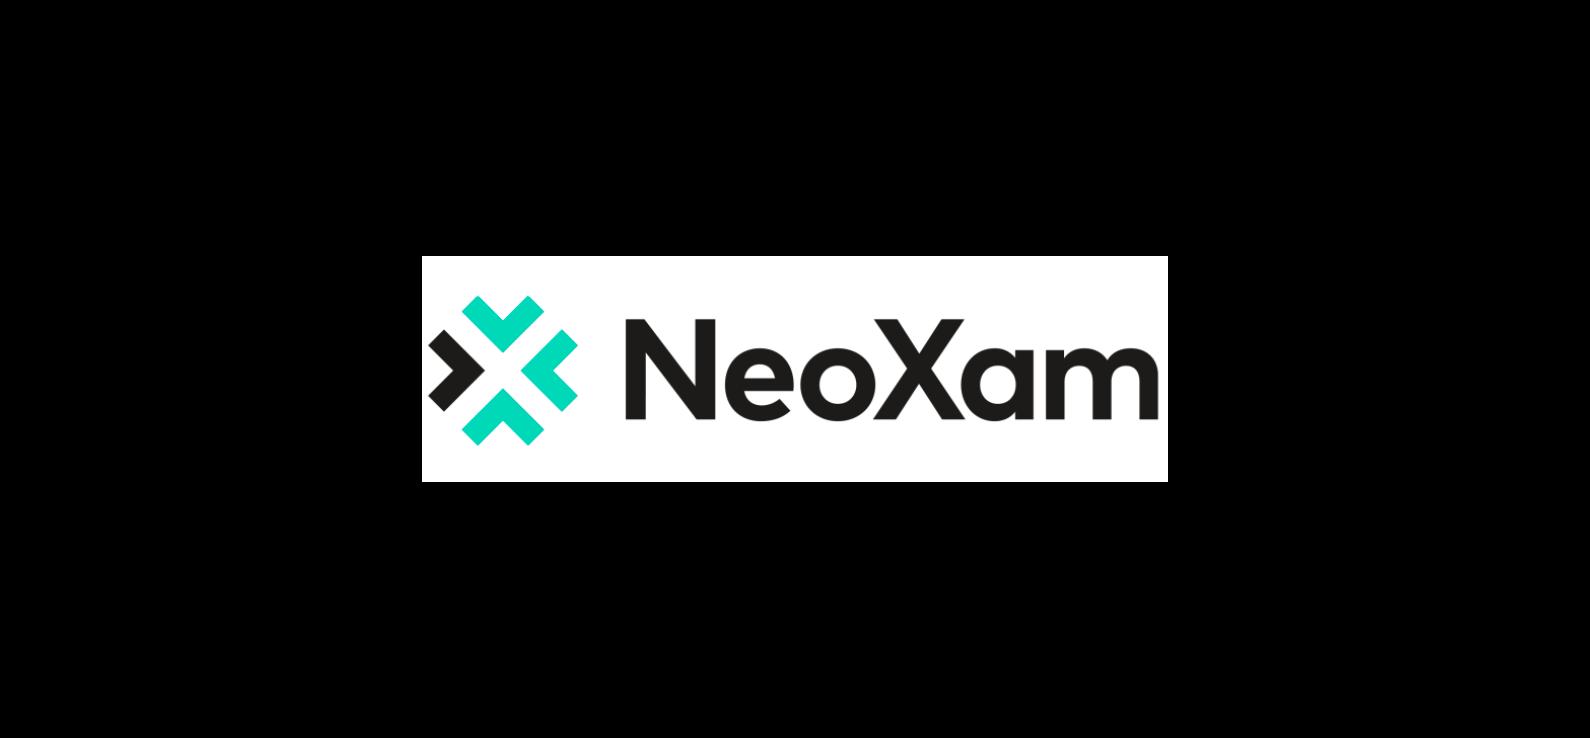 Neoxam Teams Up with Kalaxis to Meet Market Data Cost Demands